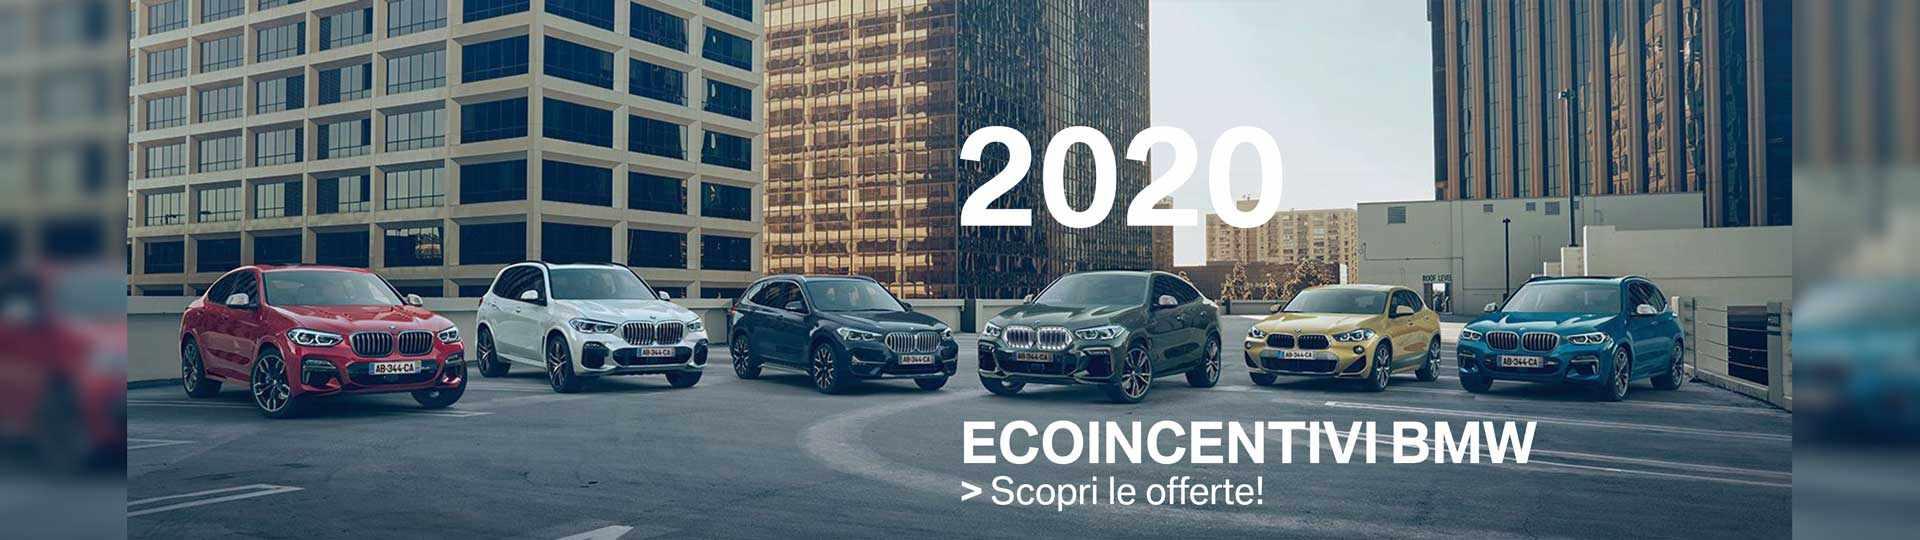 Ecoincentivi-BMW_sito-min.jpg